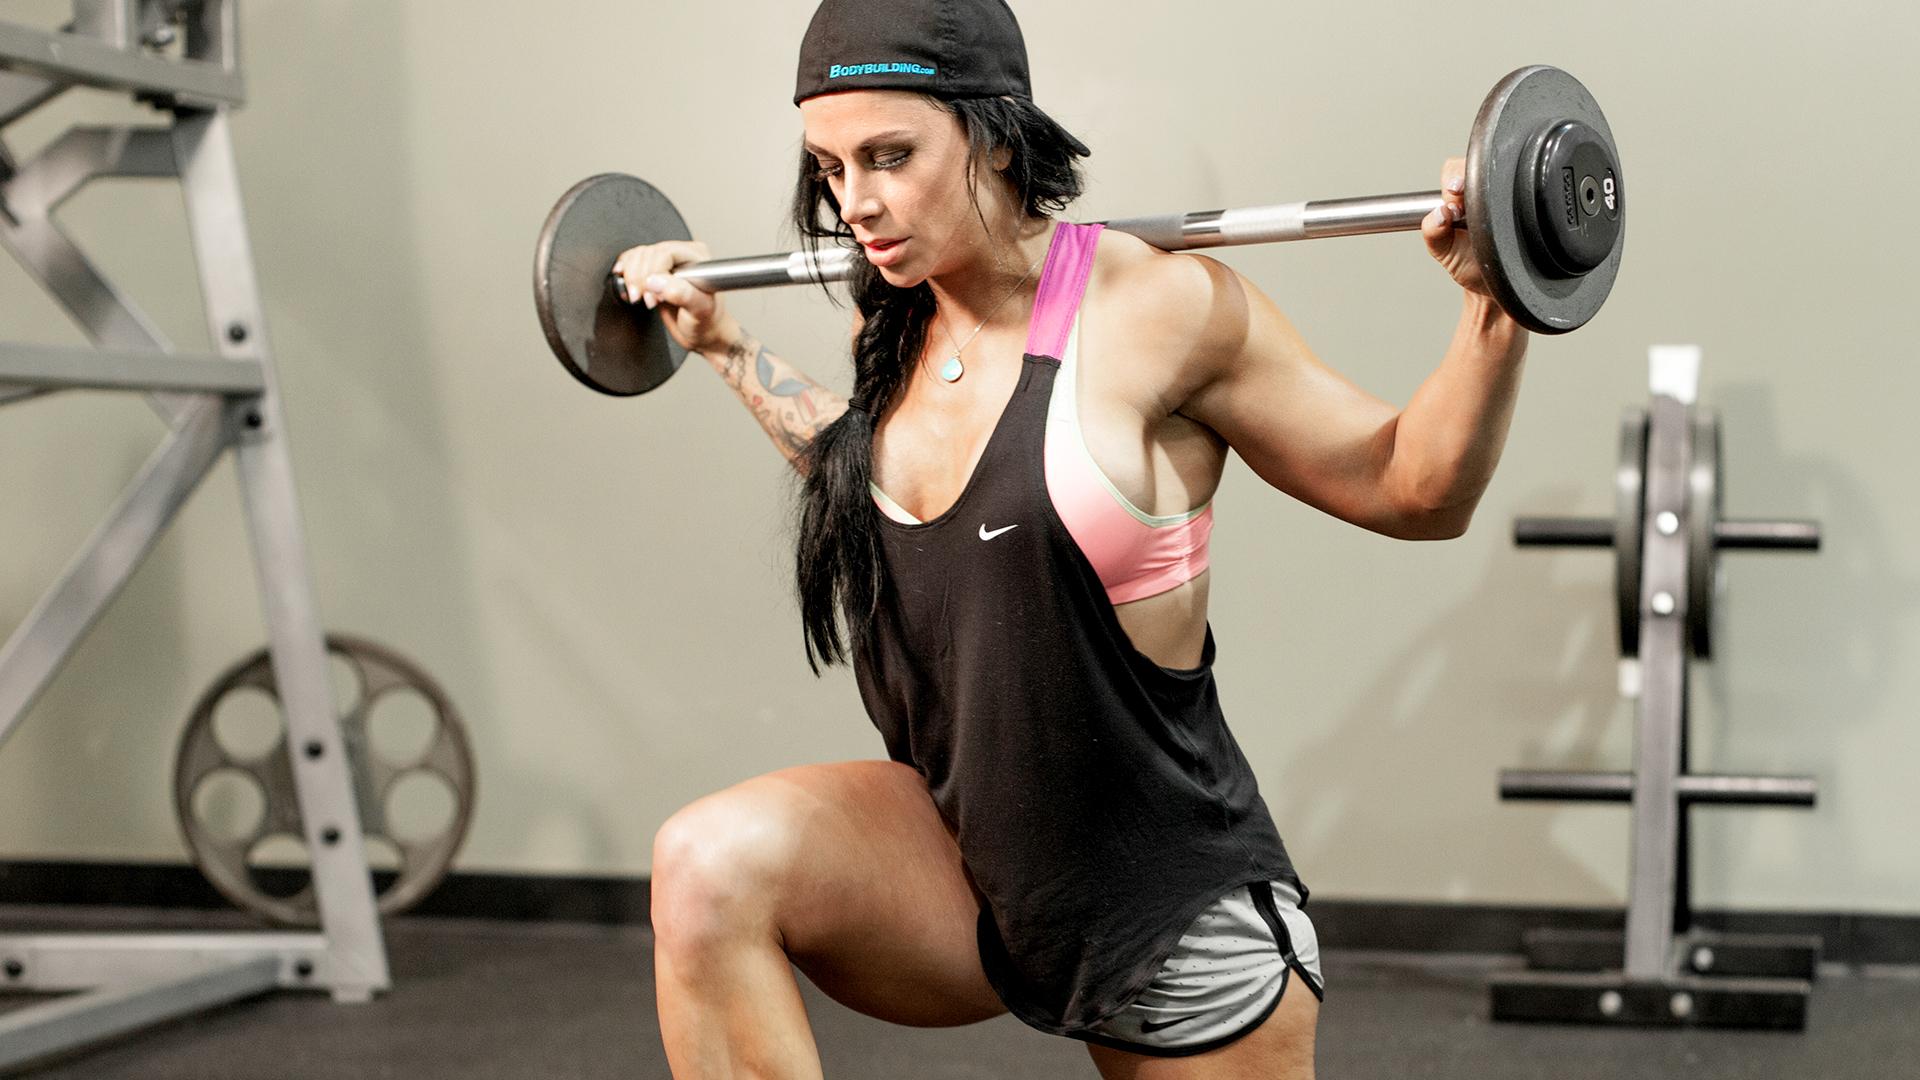 Fitness hd wallpaper background image 1920x1080 id - Wallpaper fitness women ...